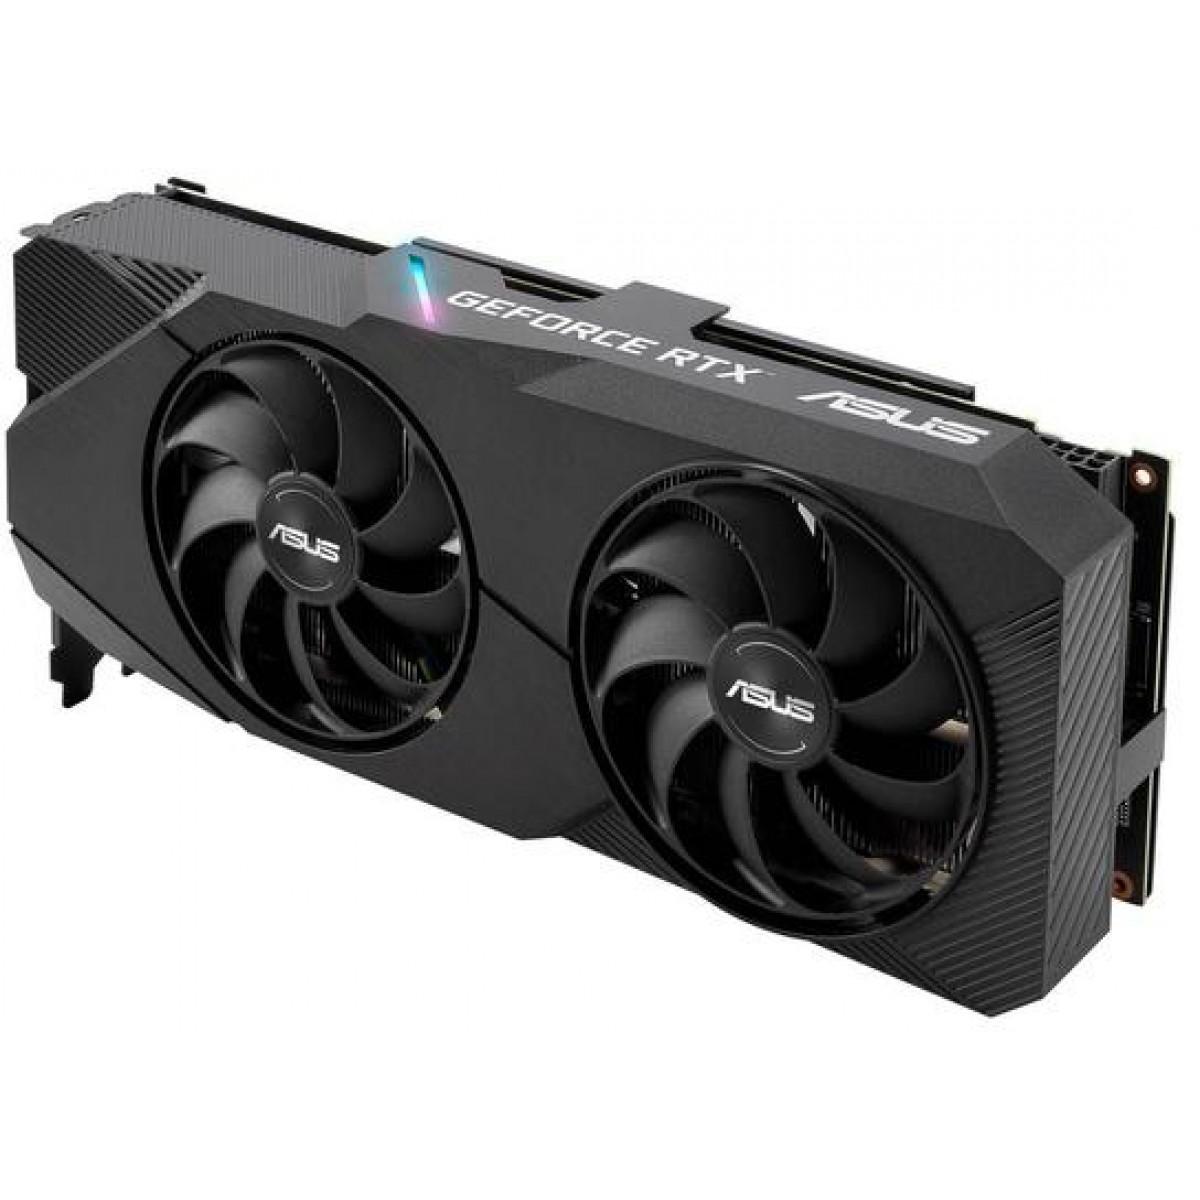 Placa de Vídeo Asus GeForce RTX 2060 Super Evo Advanced Dual, 8GB GDDR6, 256Bit, DUAL-RTX2060S-A8G-EVO